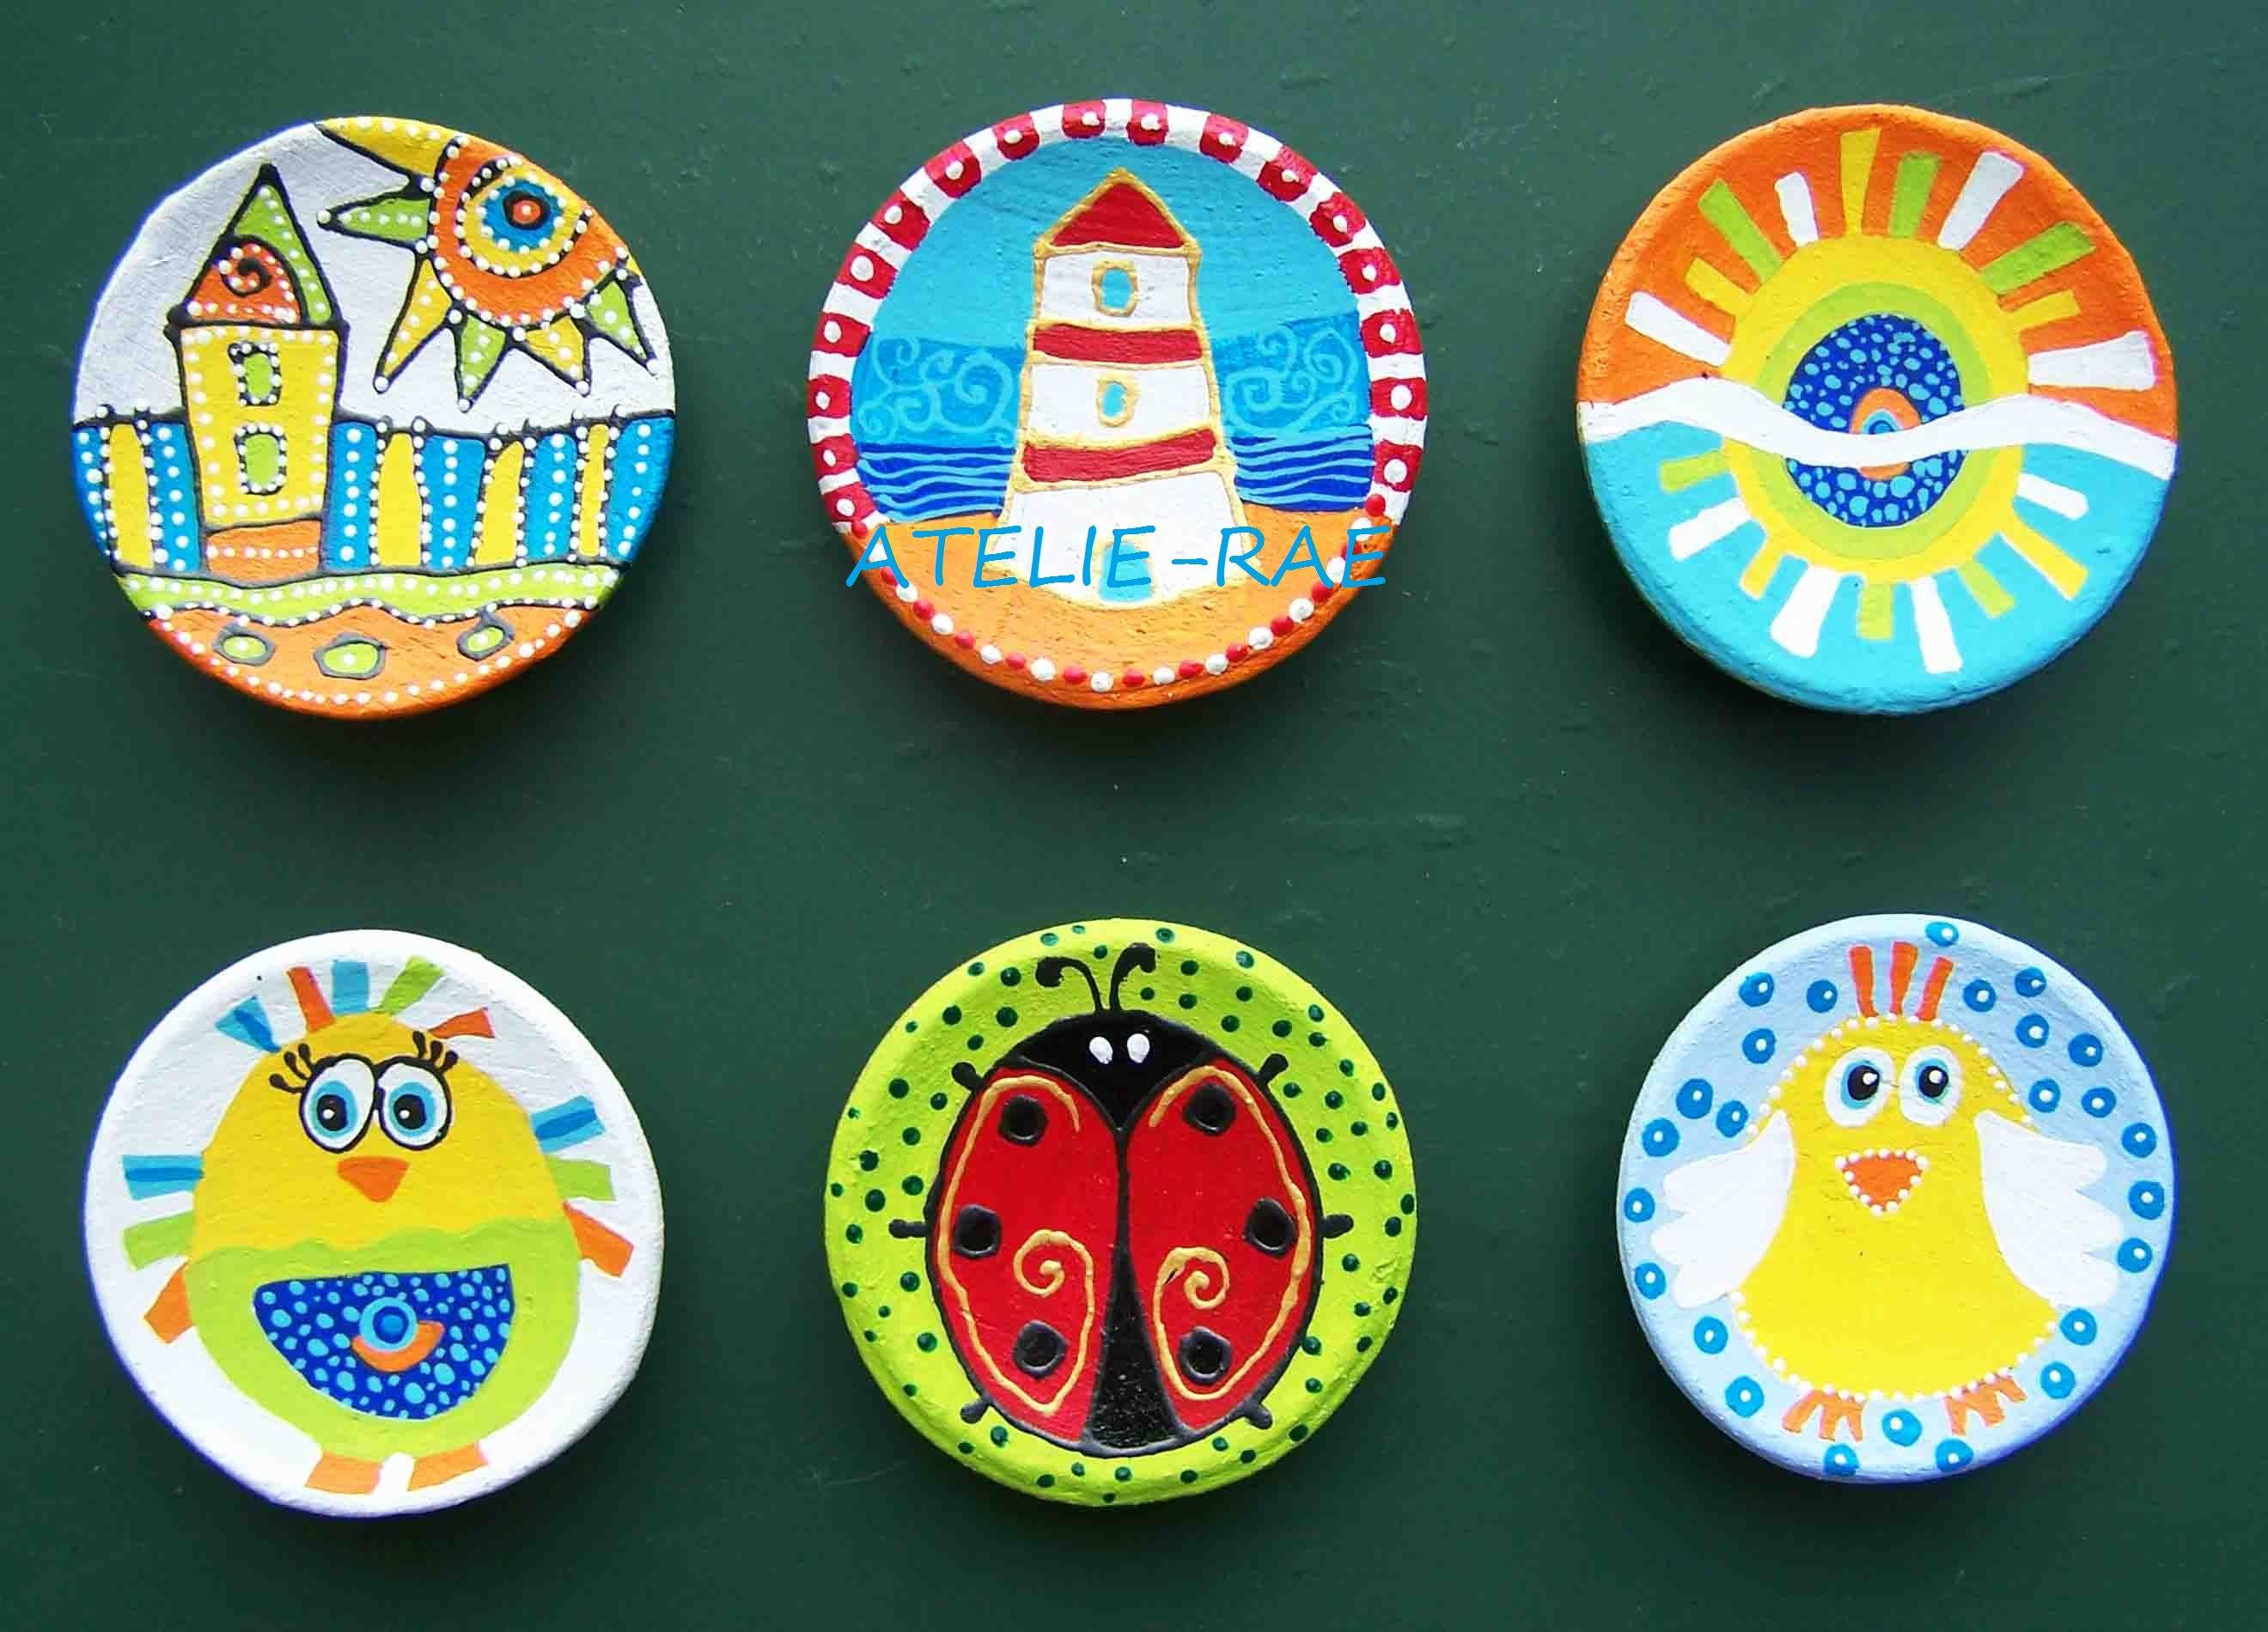 Hand Painted Ceramics Acrylic Paints Www Atelie Rae Eu Ceramic Painting Pottery Painting Hand Painted Ceramics